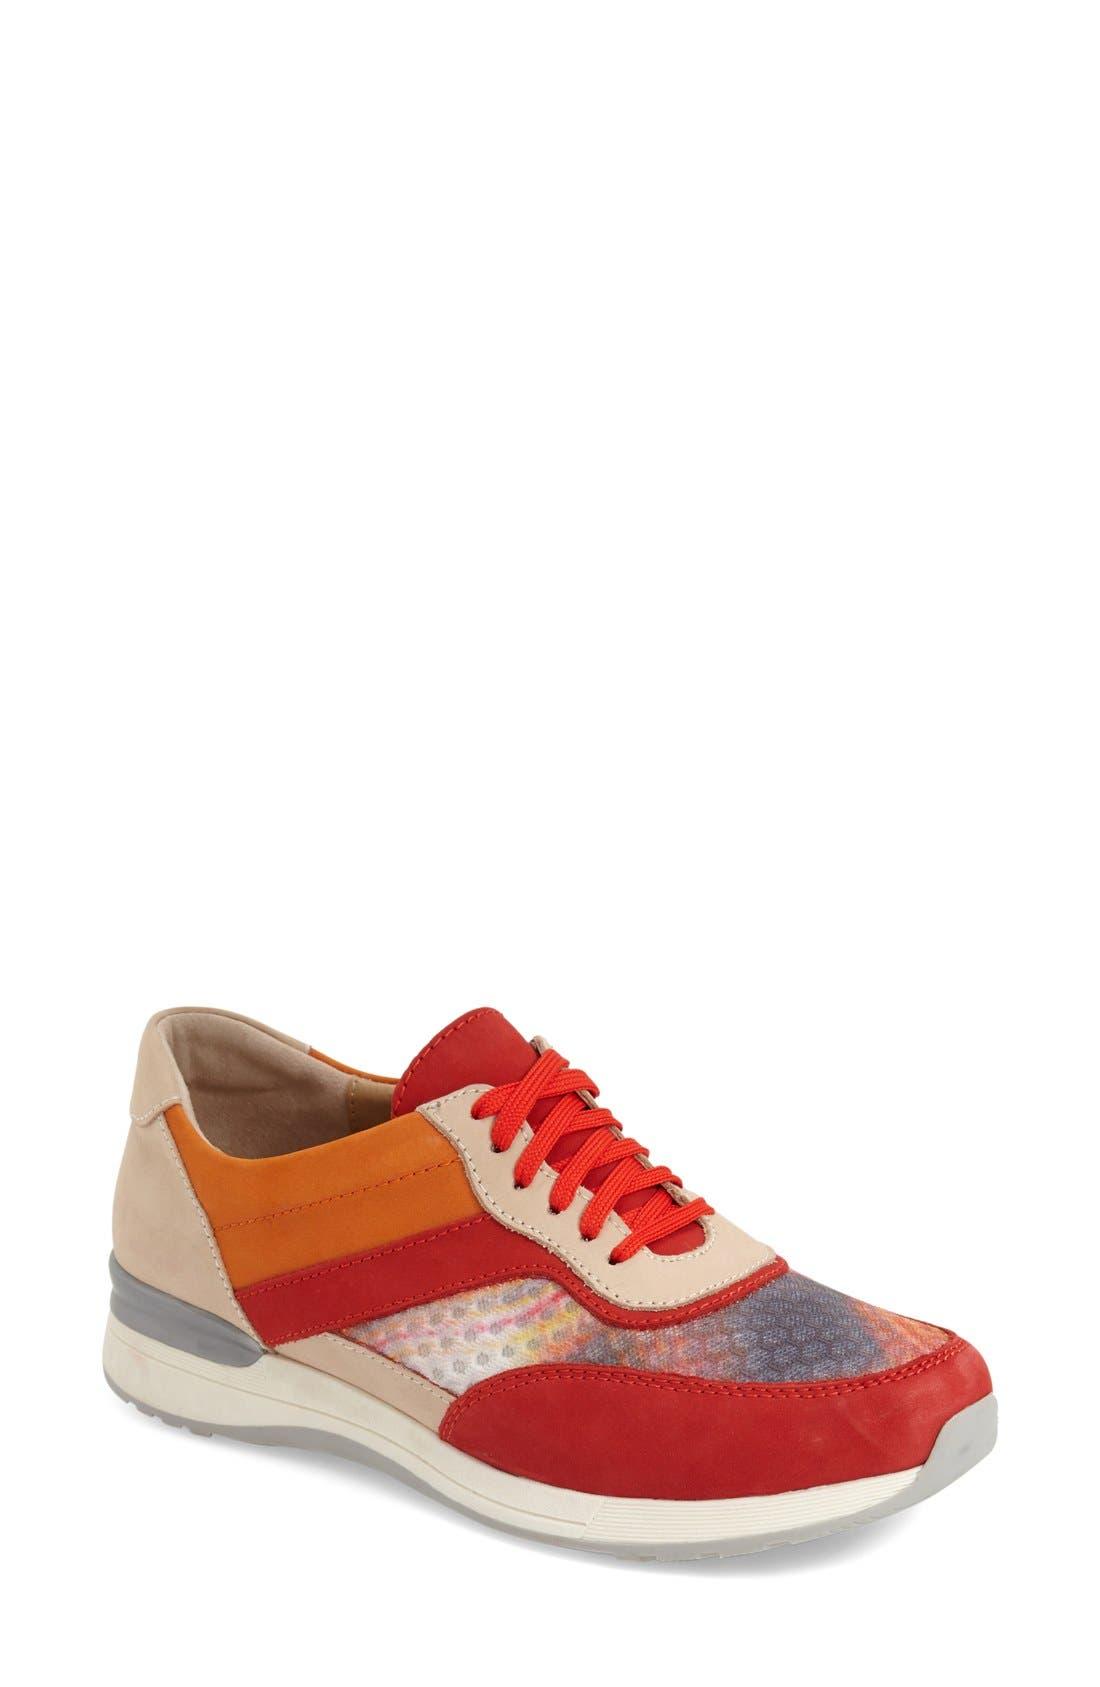 Main Image - VANELi 'Pride' Sneaker (Women)